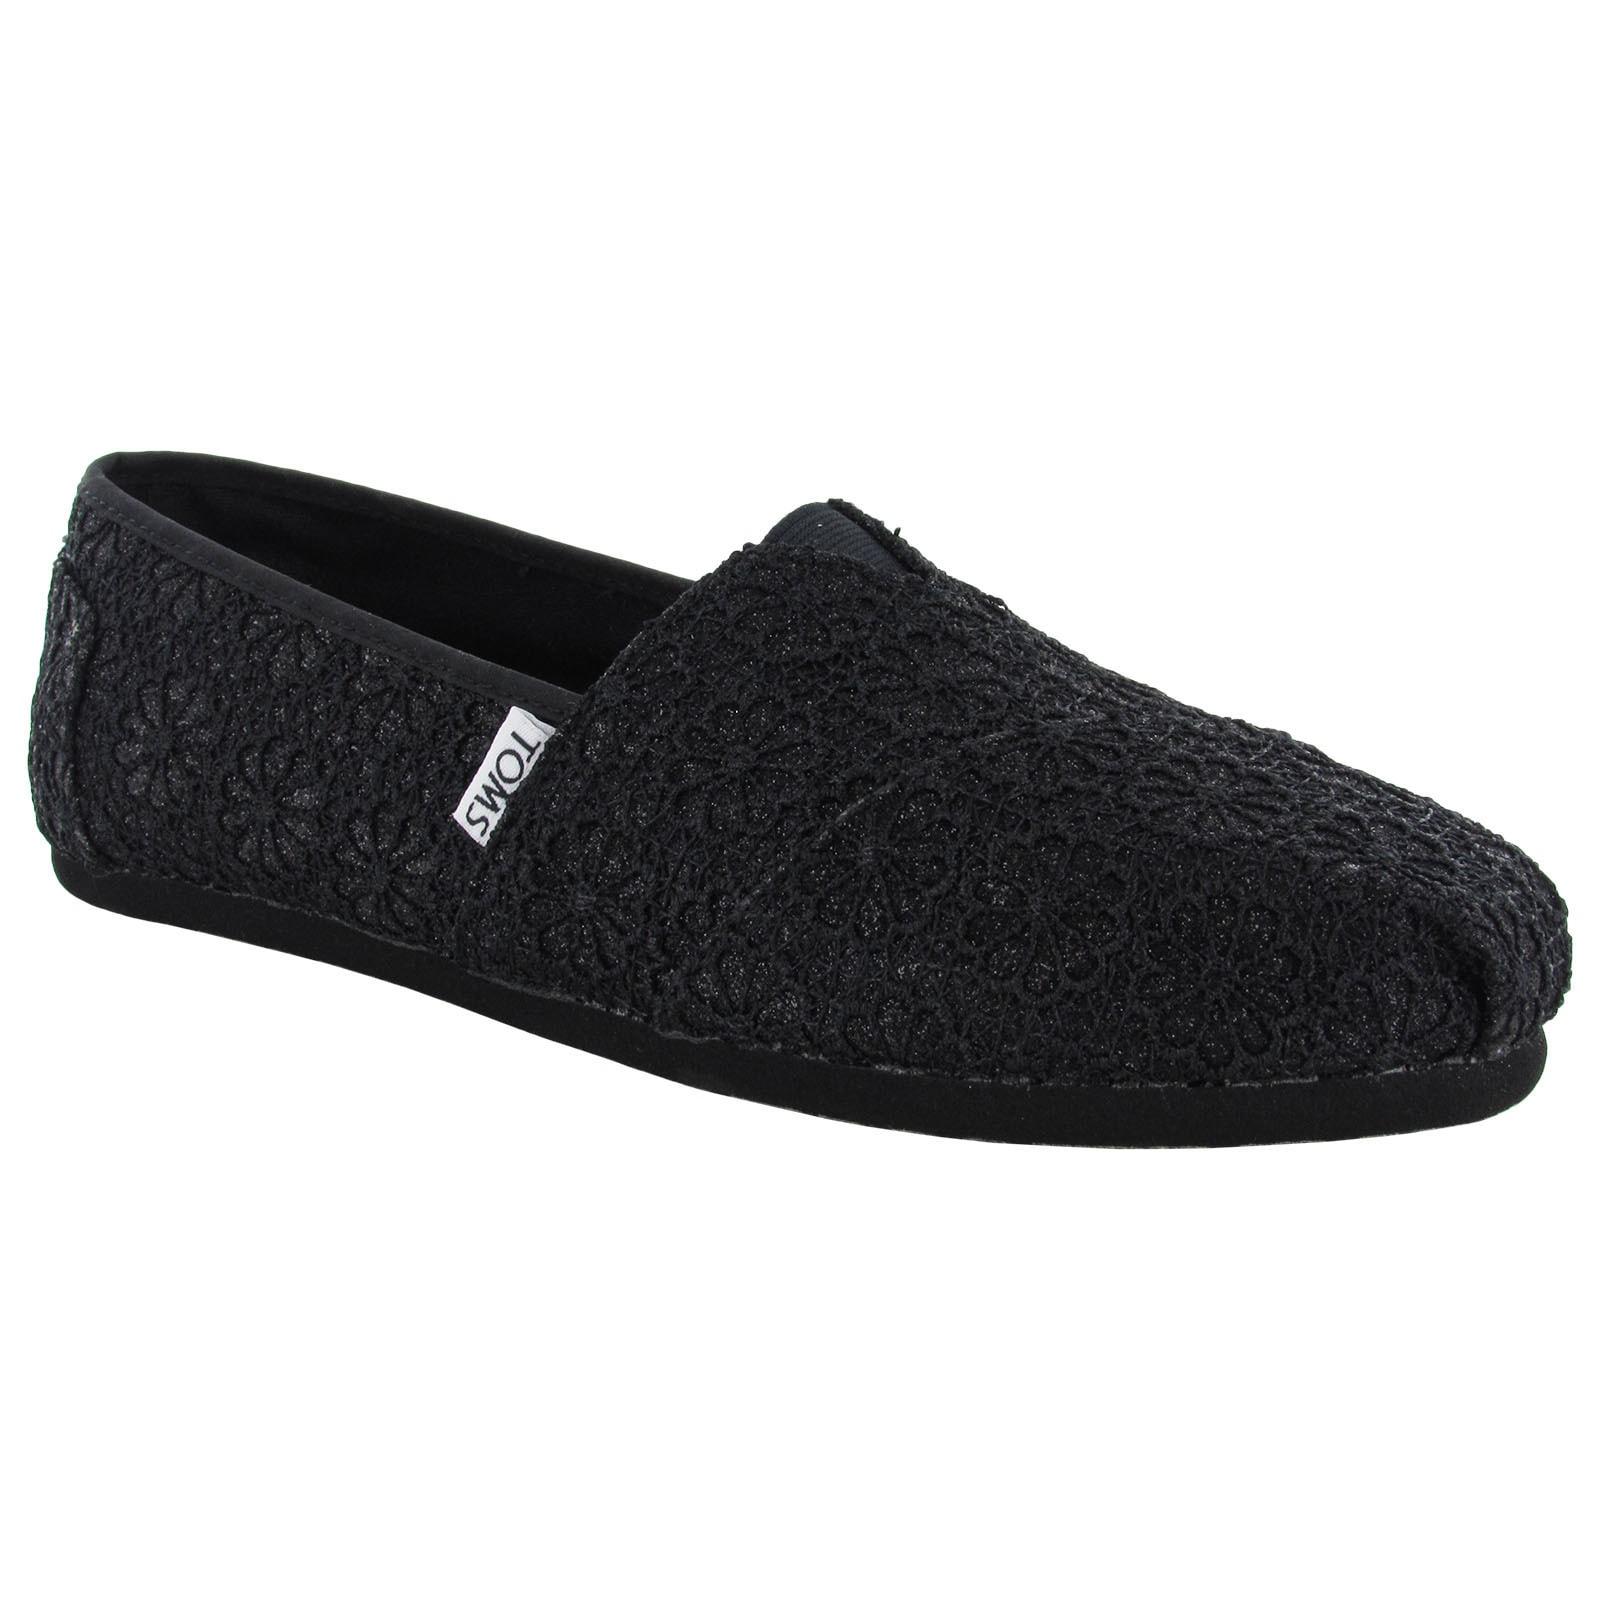 Shop Toms Womens Crochet Glitter Slip On Alpargata Flat Shoes